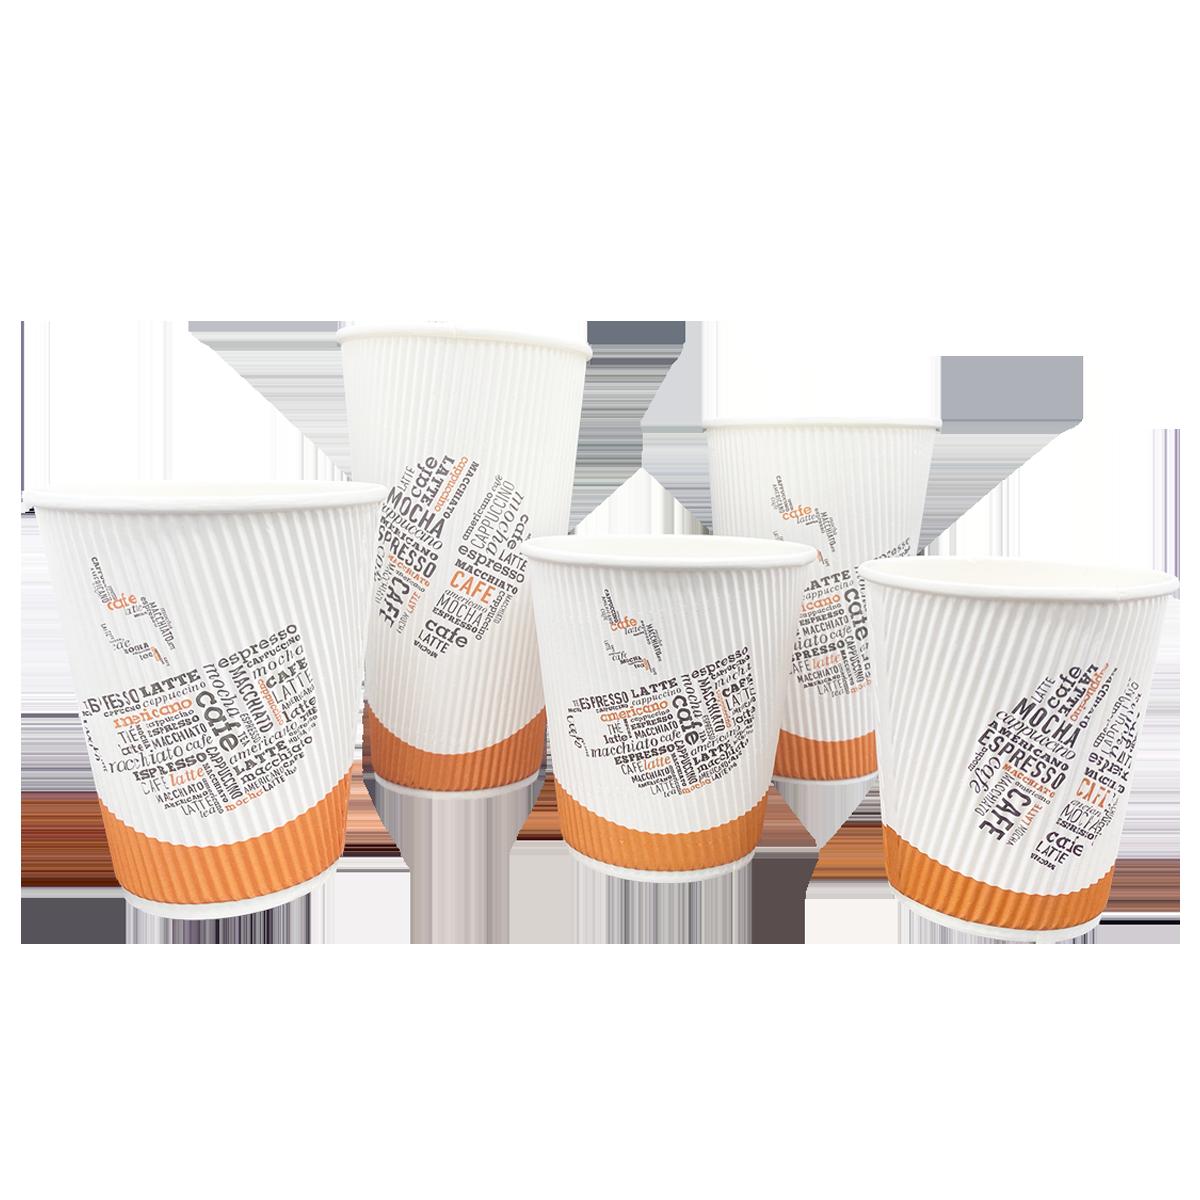 Ripple Mocha Cups